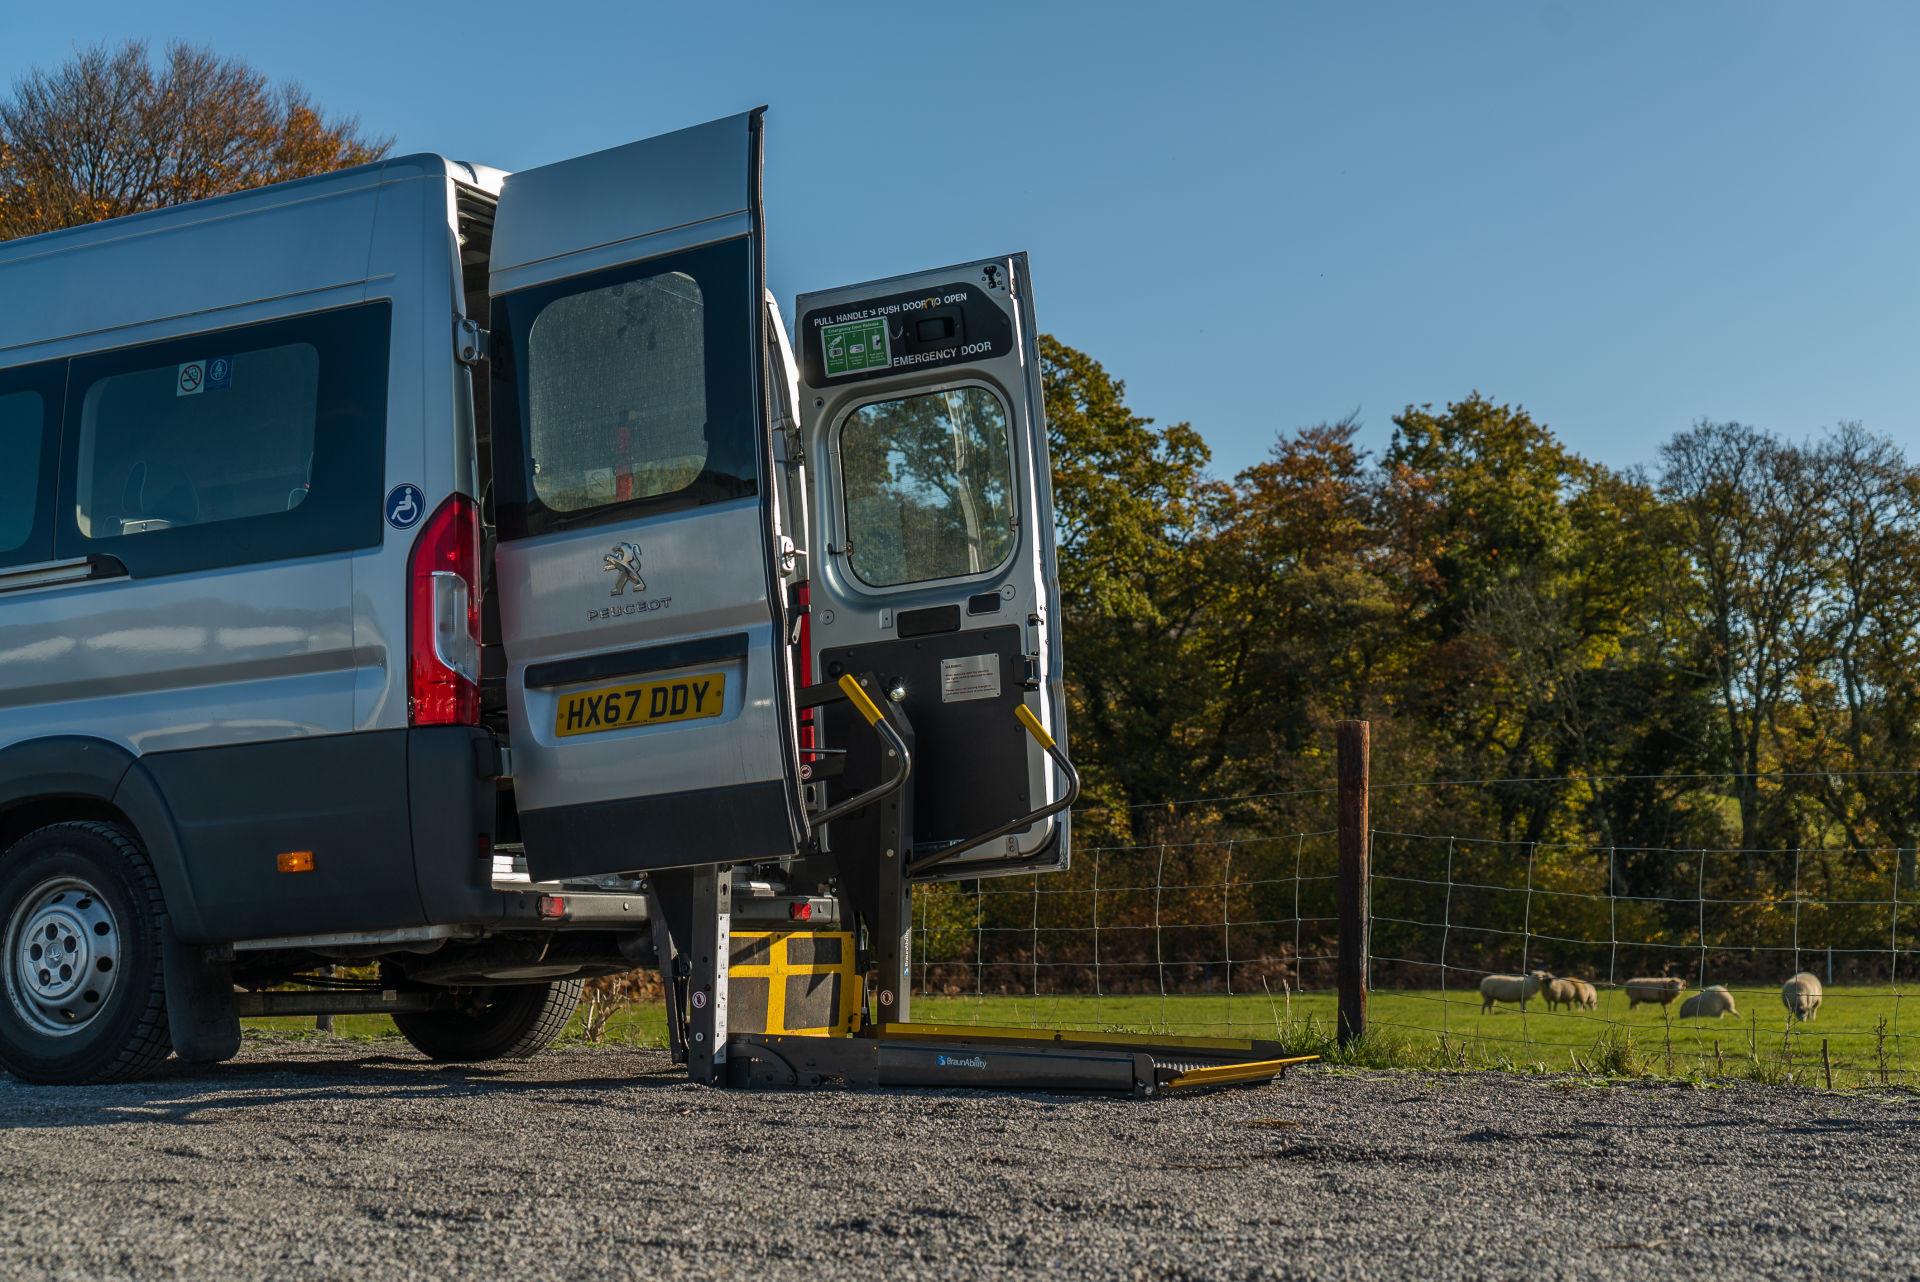 Peugeot Boxer 17 Seater Accessible Minibus for Sale - Image 6